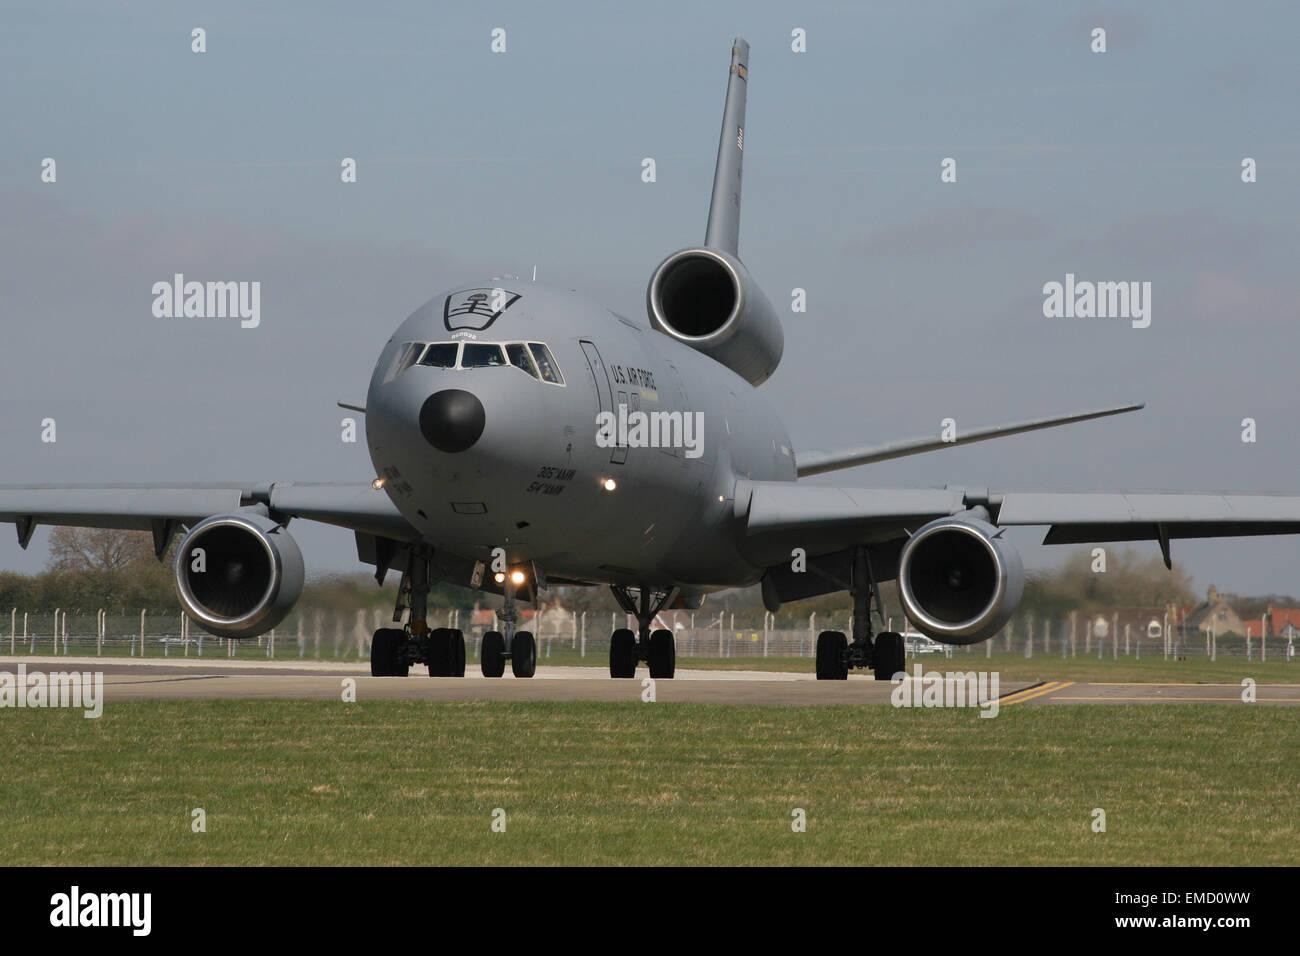 USAF US AIR FORCE KC10 TANKER - Stock Image